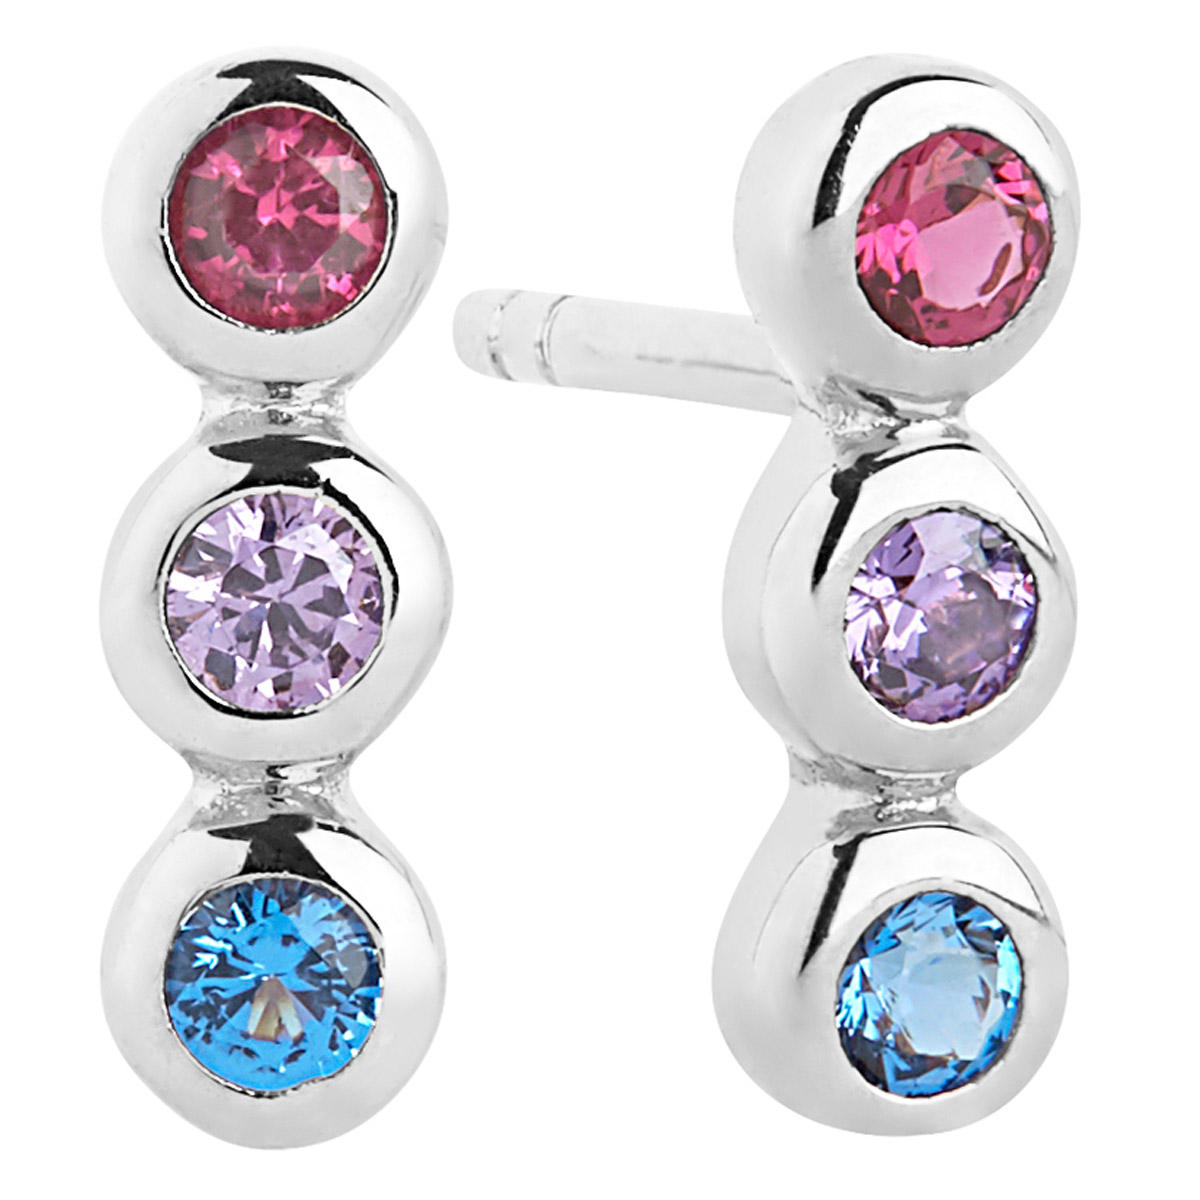 bei Uhrcenter: Sif Jakobs Jewellery SJ-E2640-XCZ Silber Damen-Ohrringe Sardinien Tre Piccolo - Schmuck